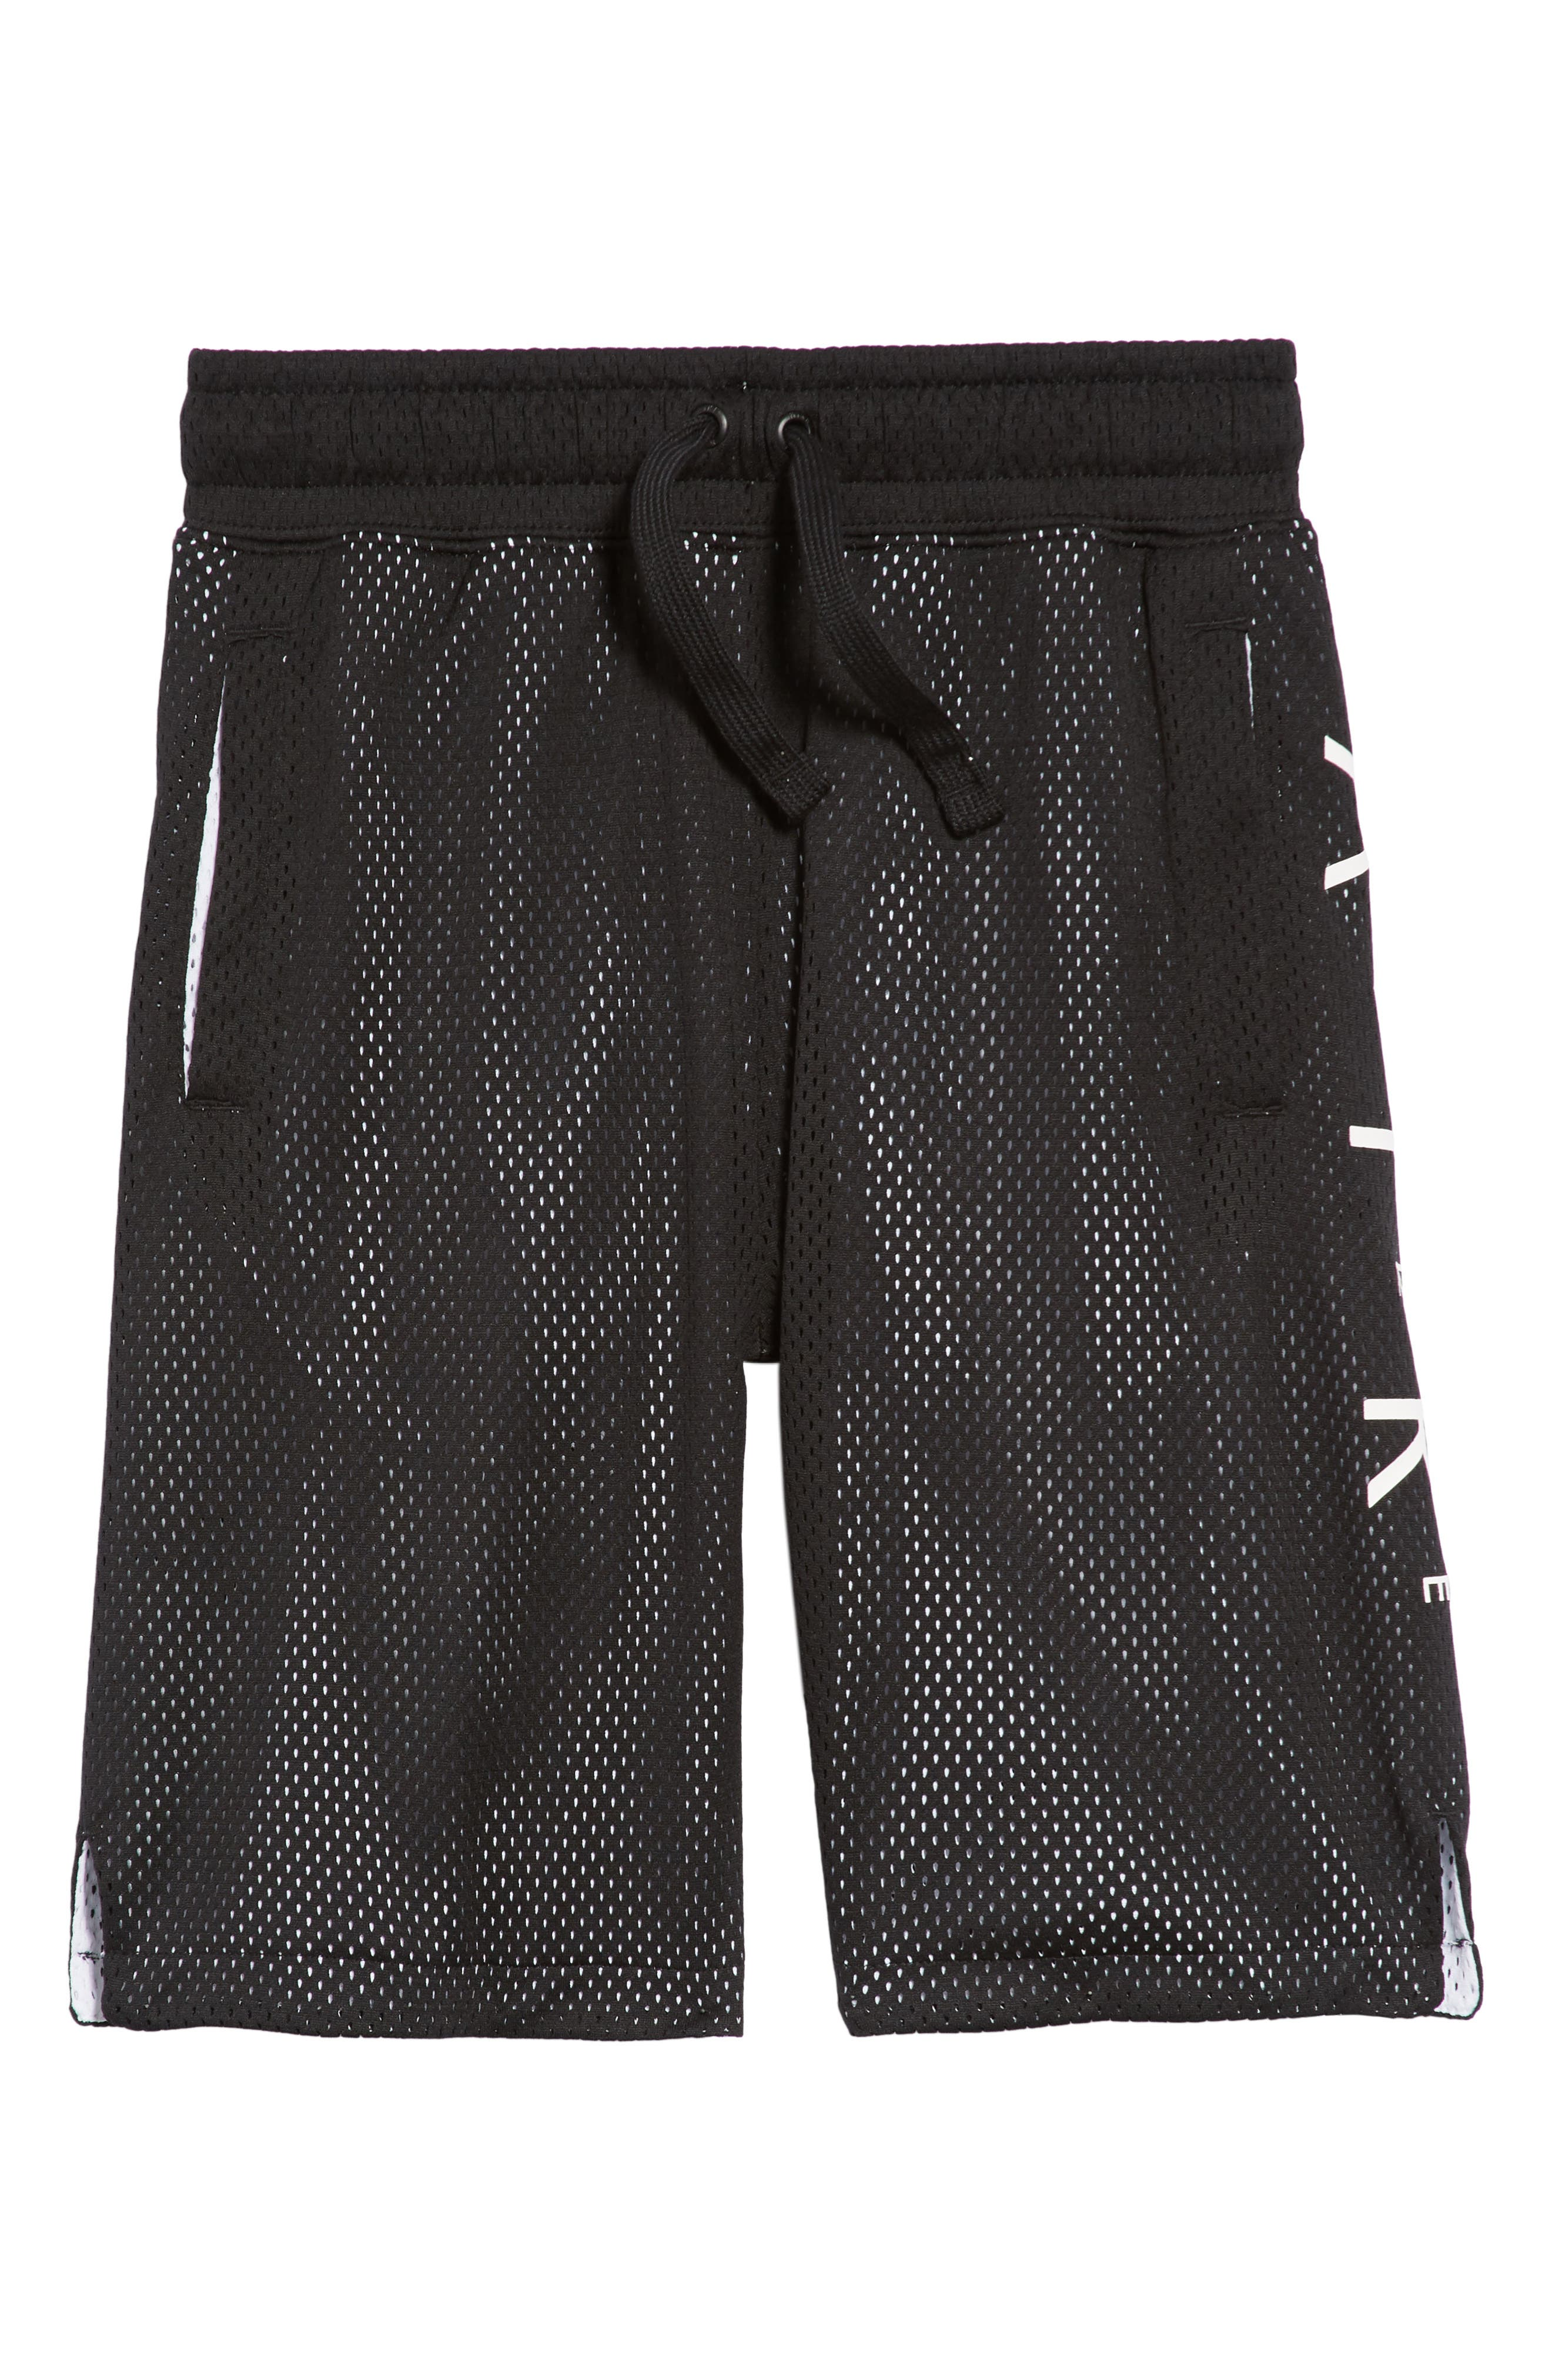 Sportswear Air Knit Shorts,                         Main,                         color, Black/ White